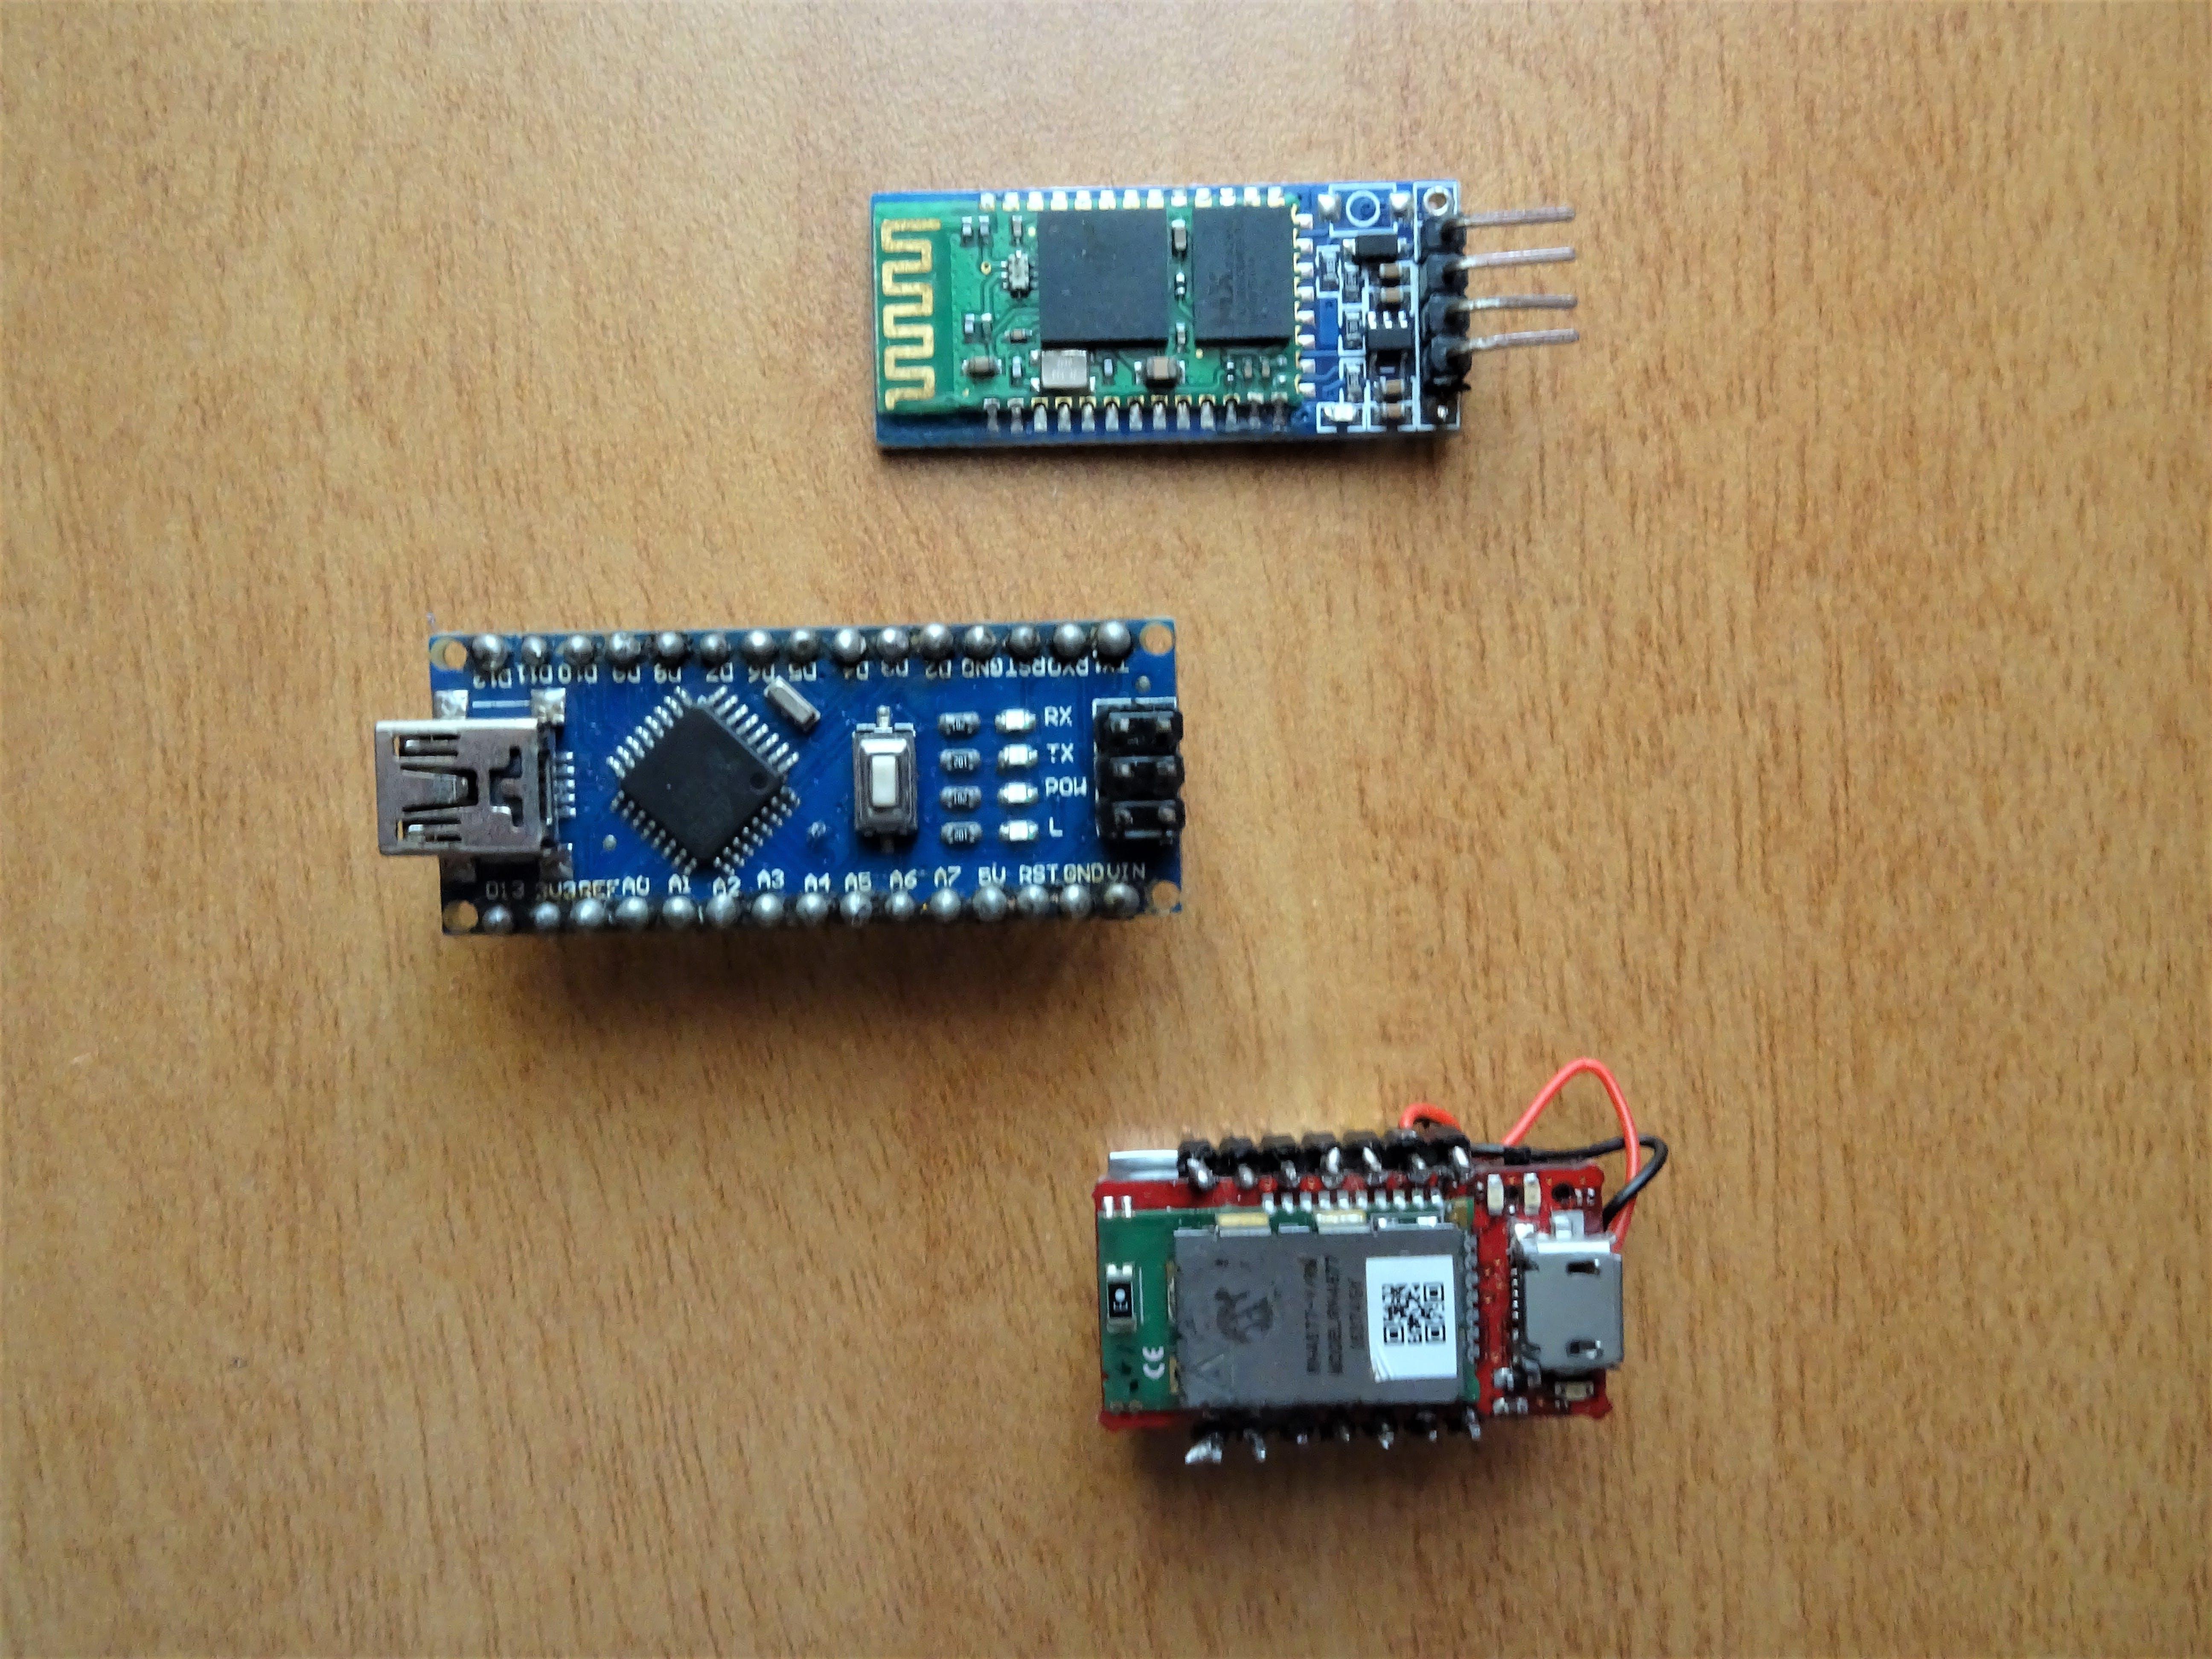 Wifi Module, Arduino NANO and Infineon's Pressure Sensor